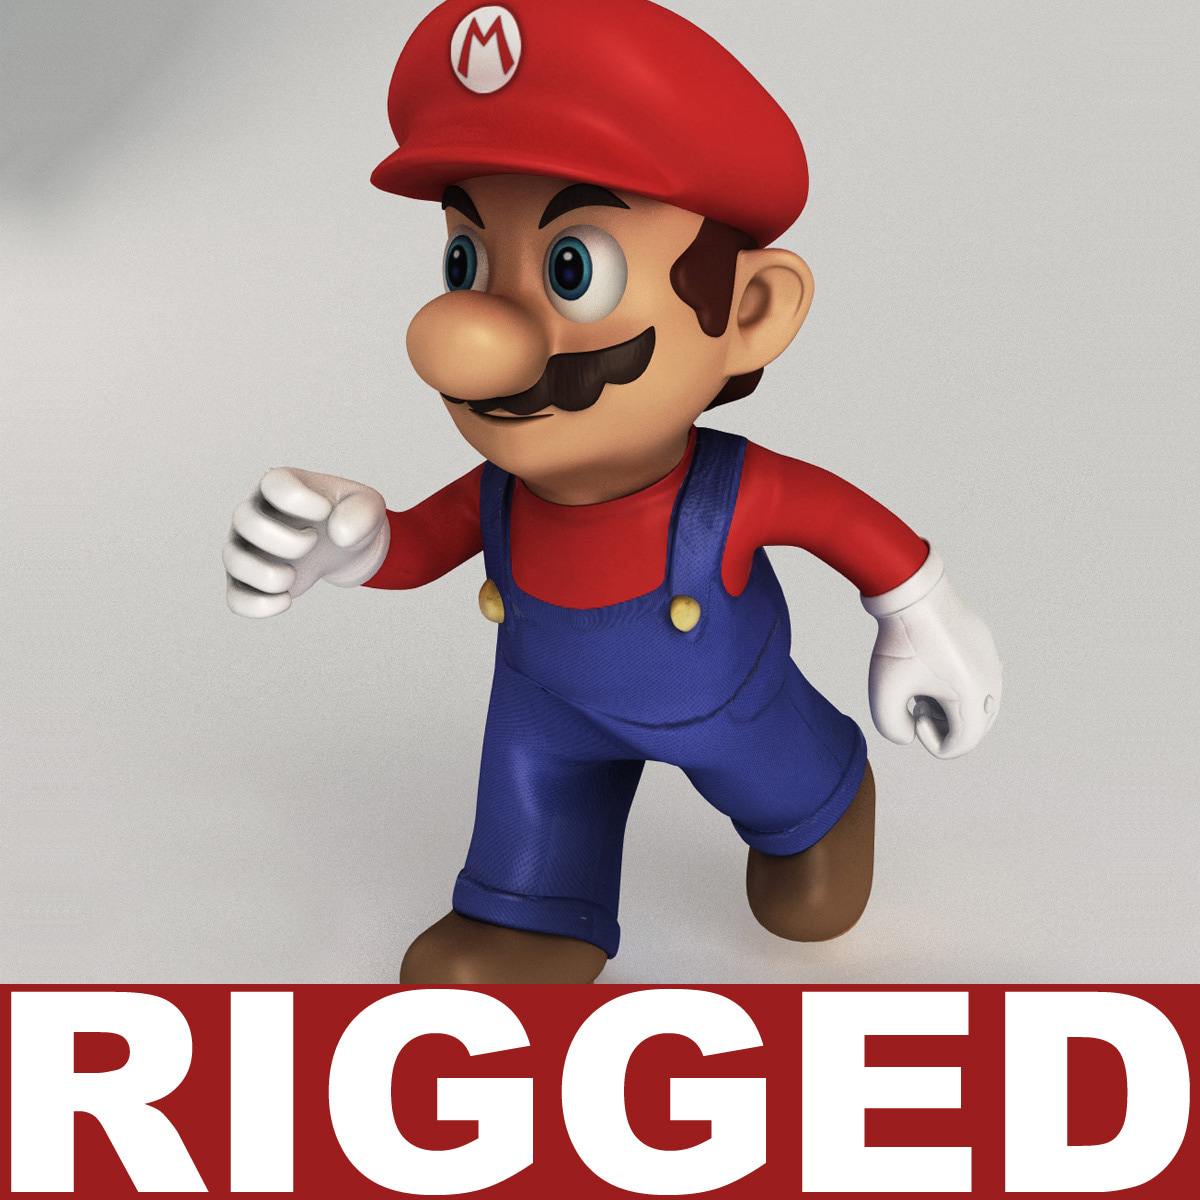 Super_Mario_Rigged_00.jpg